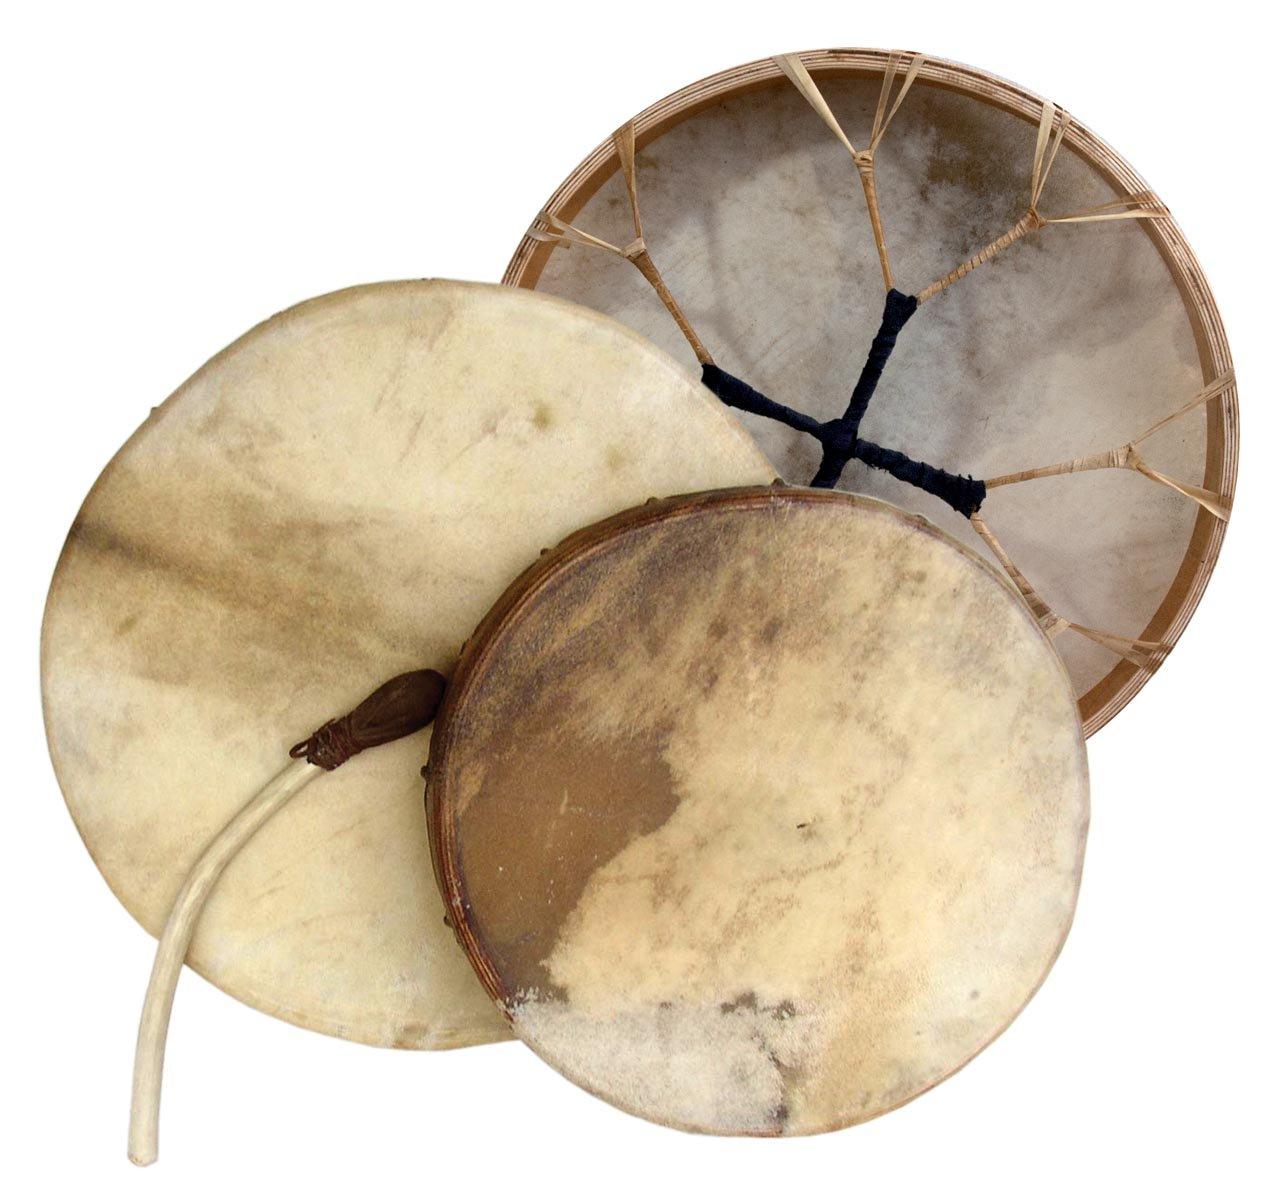 Shaman drum round 20'' with goat skin, Frame Drum, handmade